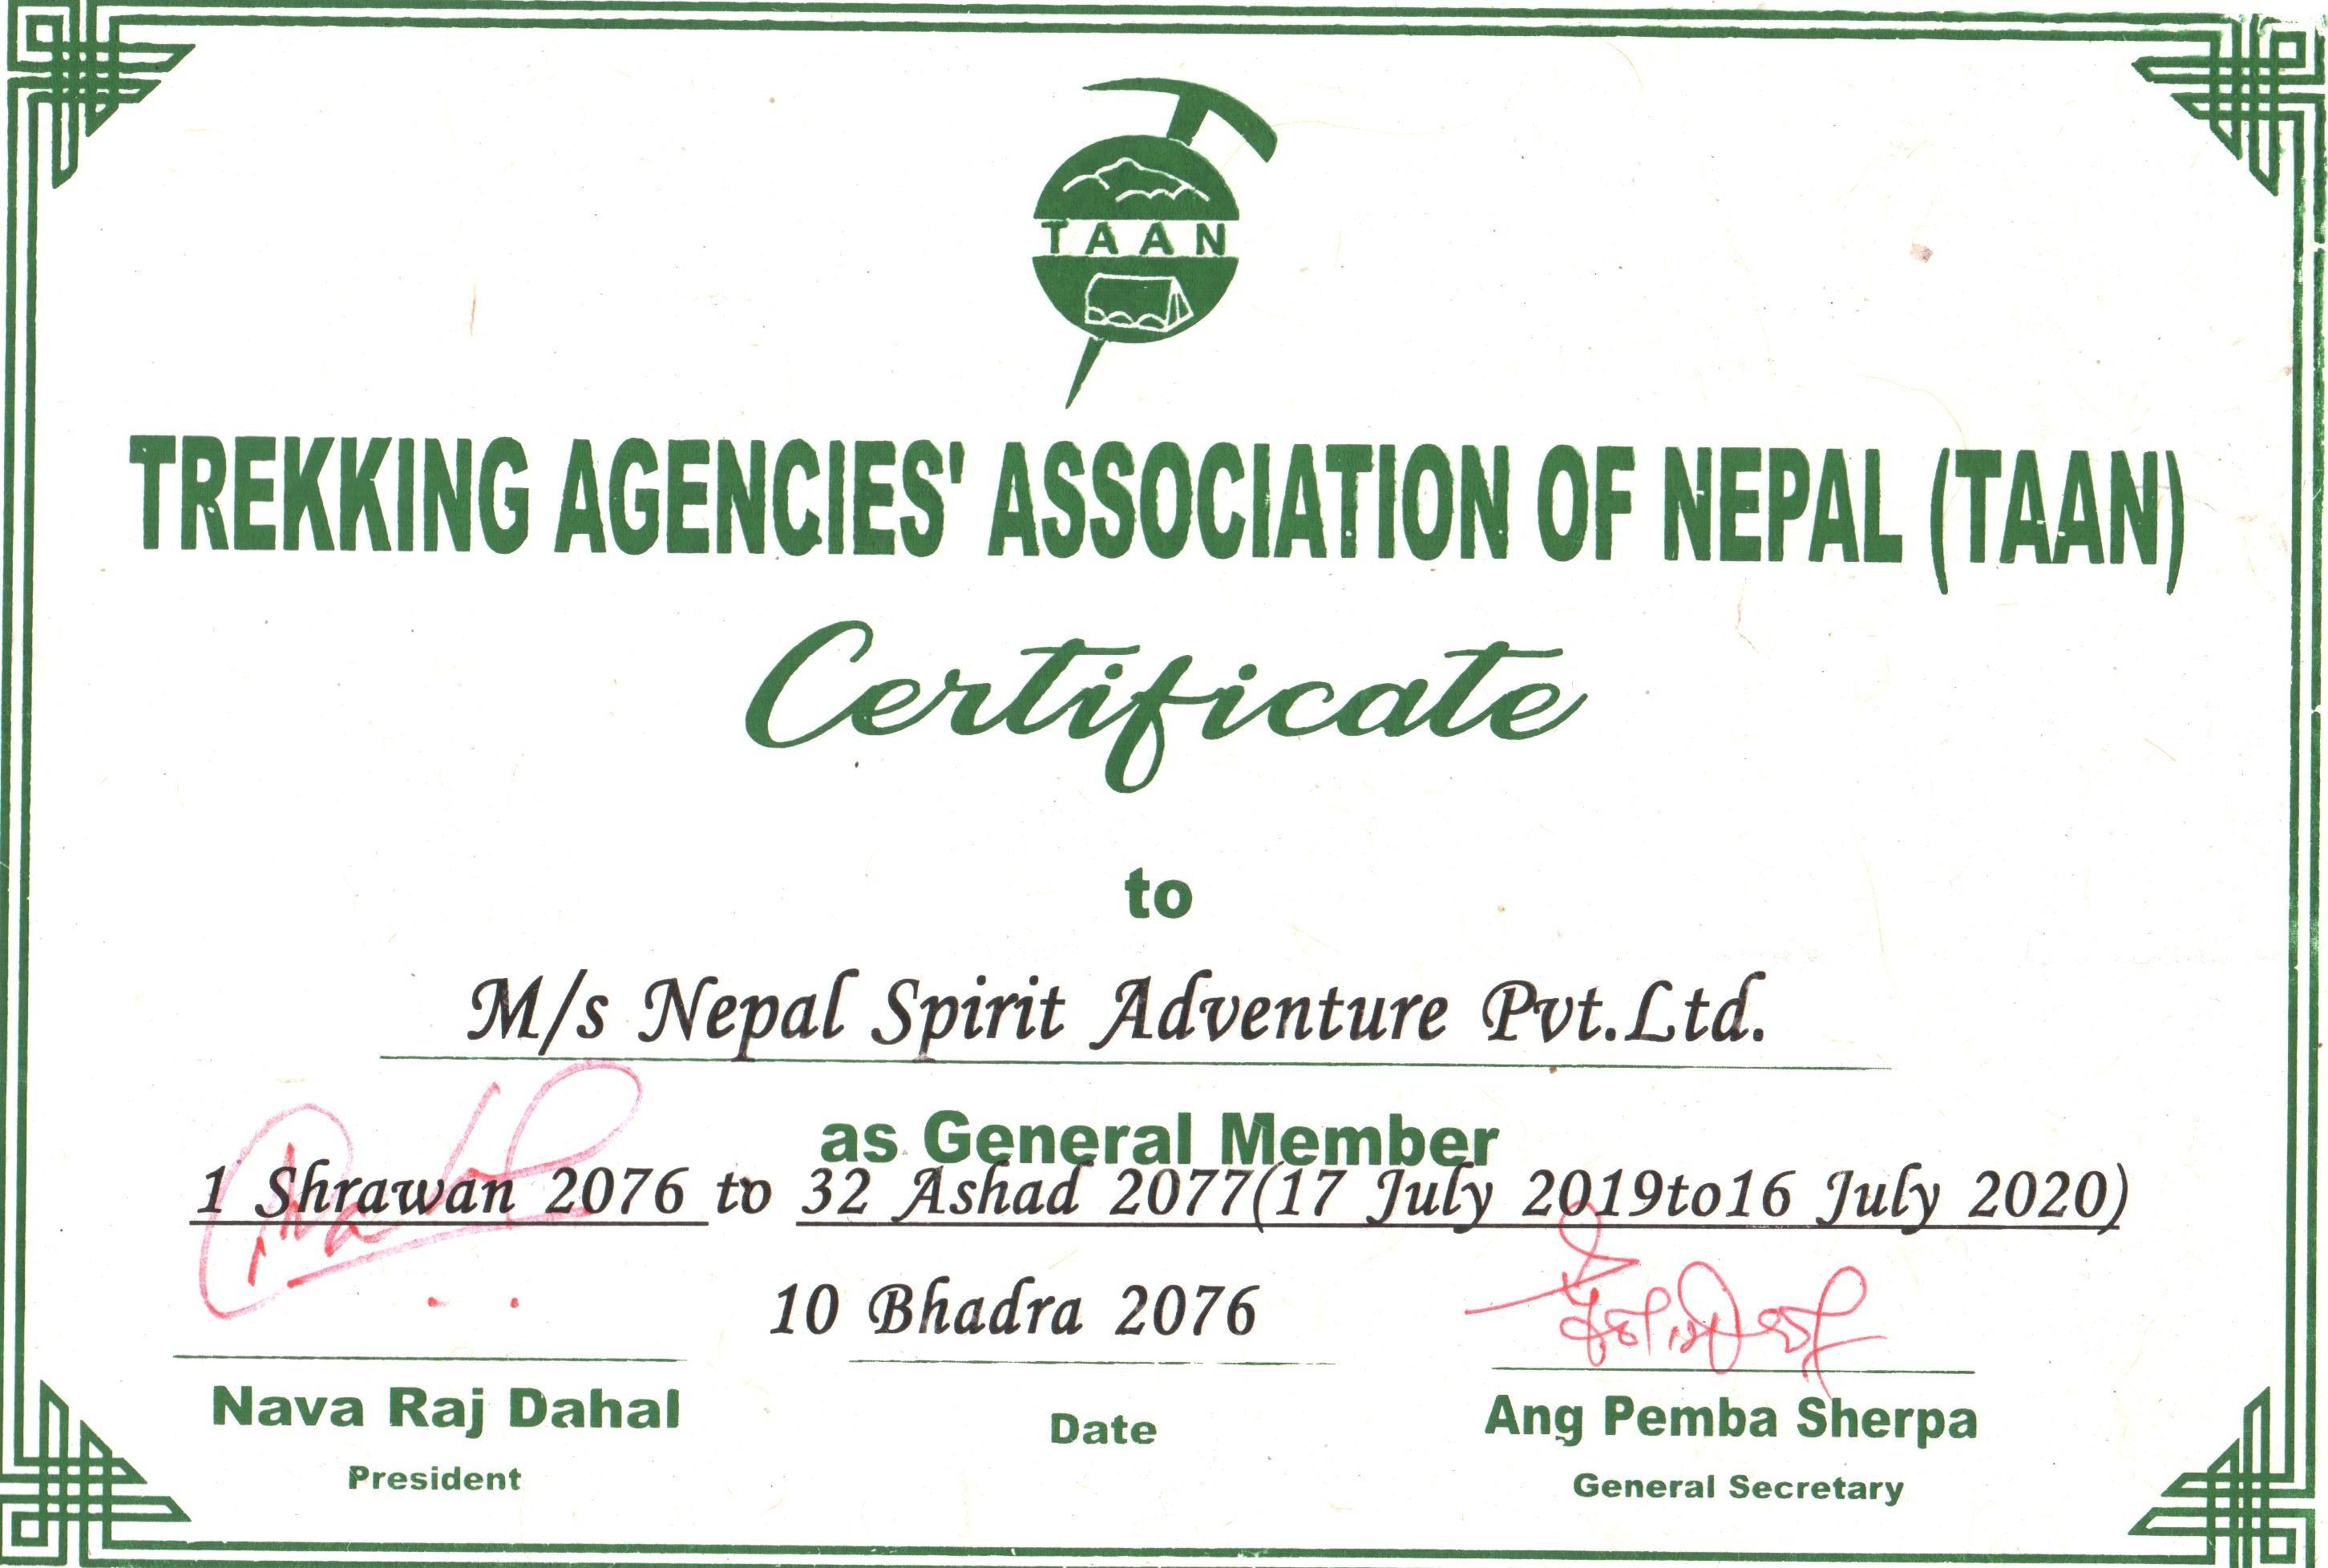 Trekking Agencies' Association of Nepal (TAAN)